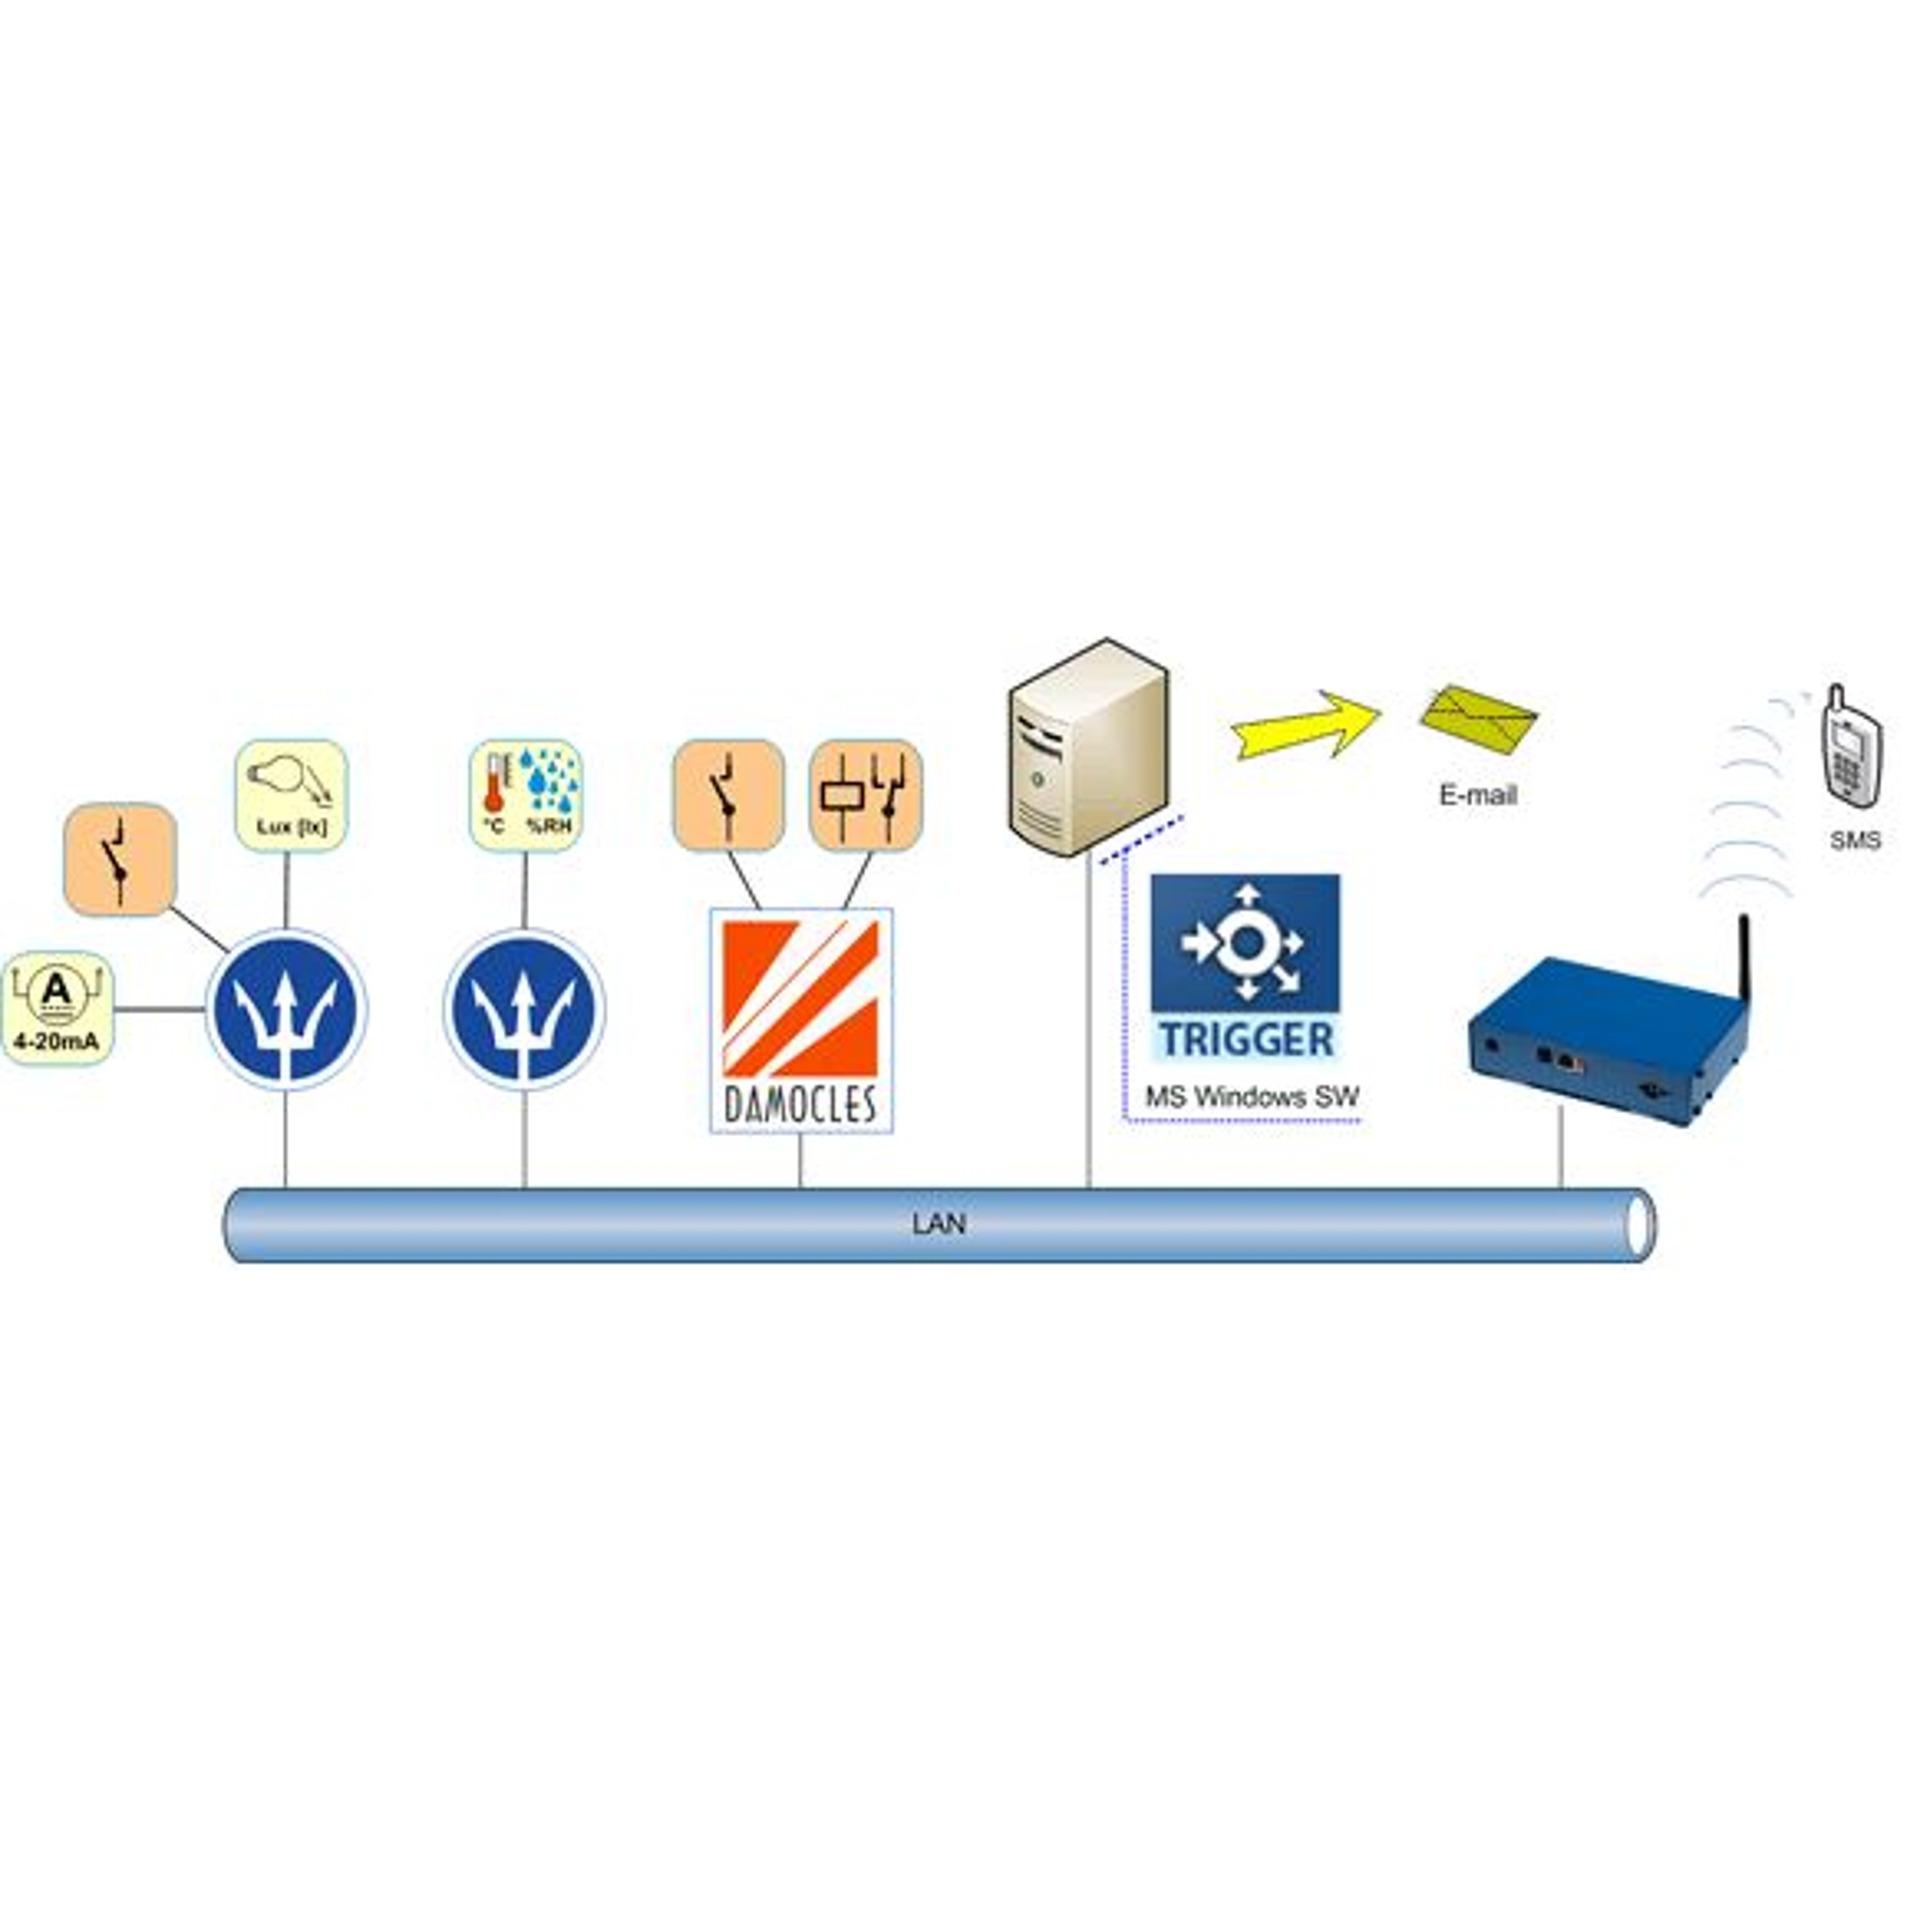 HWg-Trigger Alarmierungssoftware - HW group - BellEquip